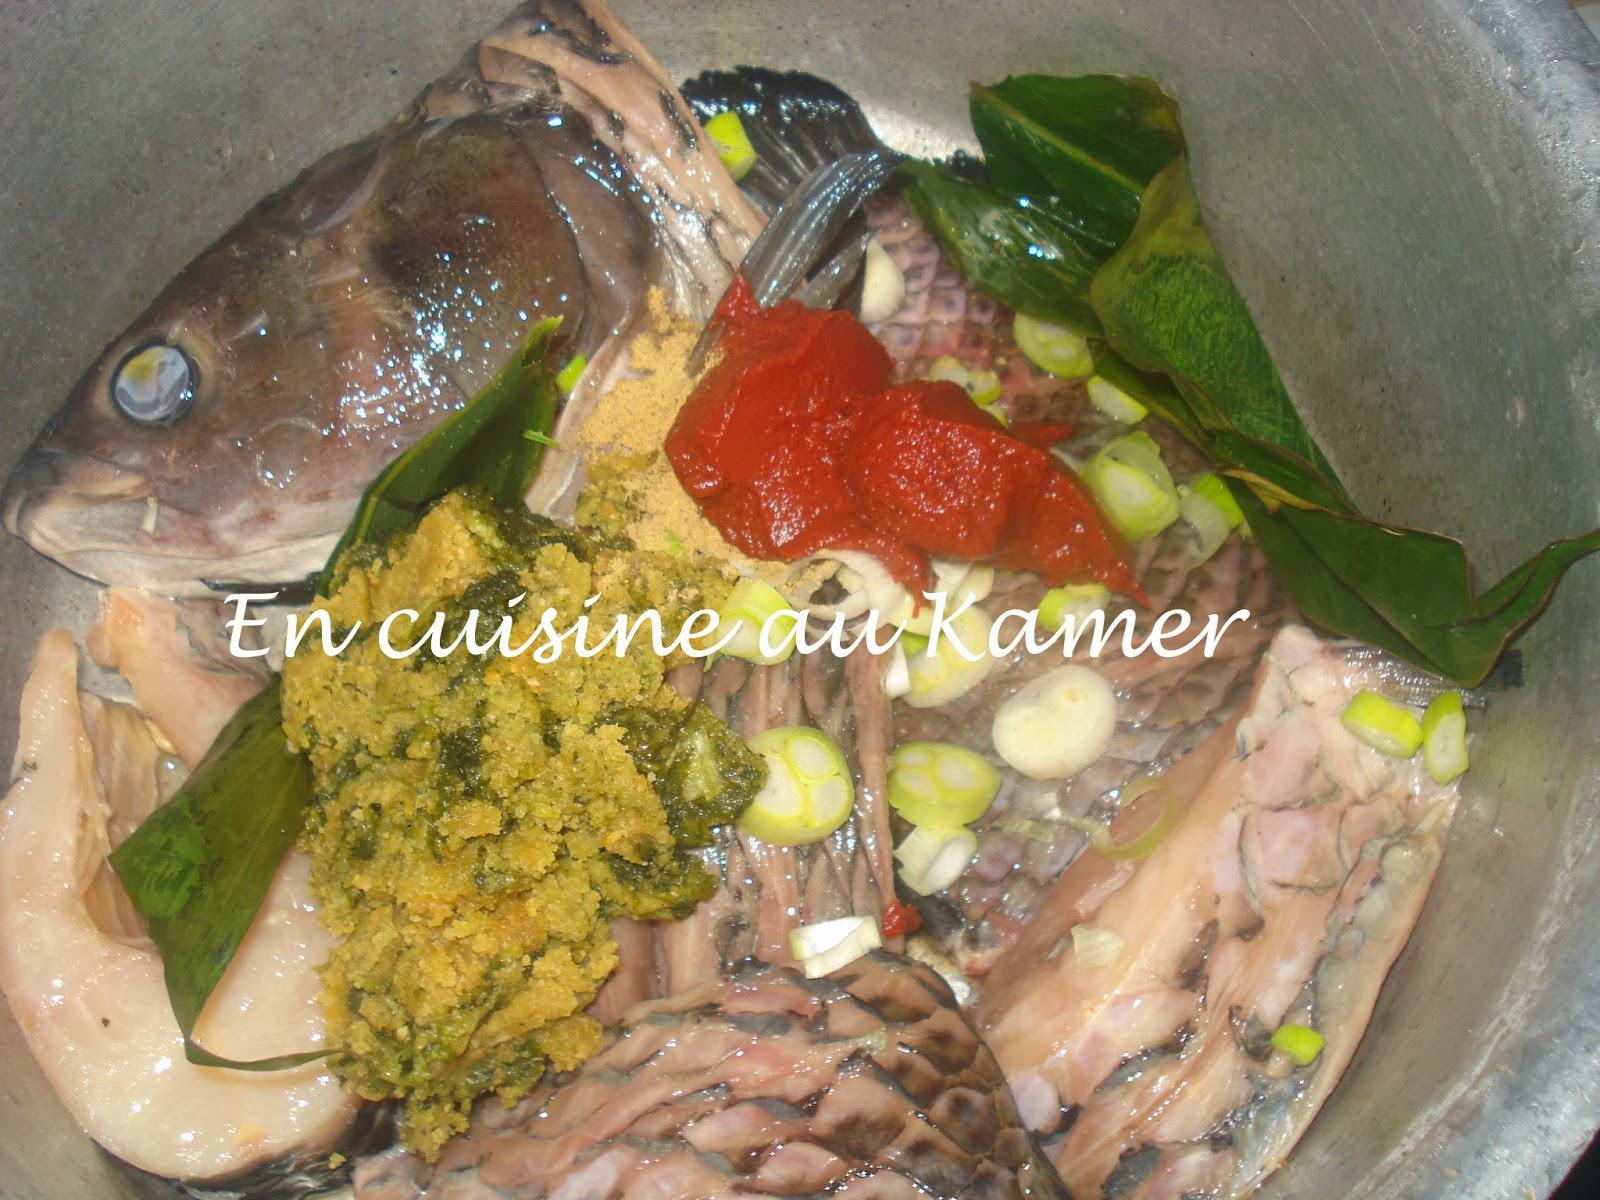 Kanga au bouillon de njansang la cuisine camerounaise - Cuisine africaine camerounaise ...